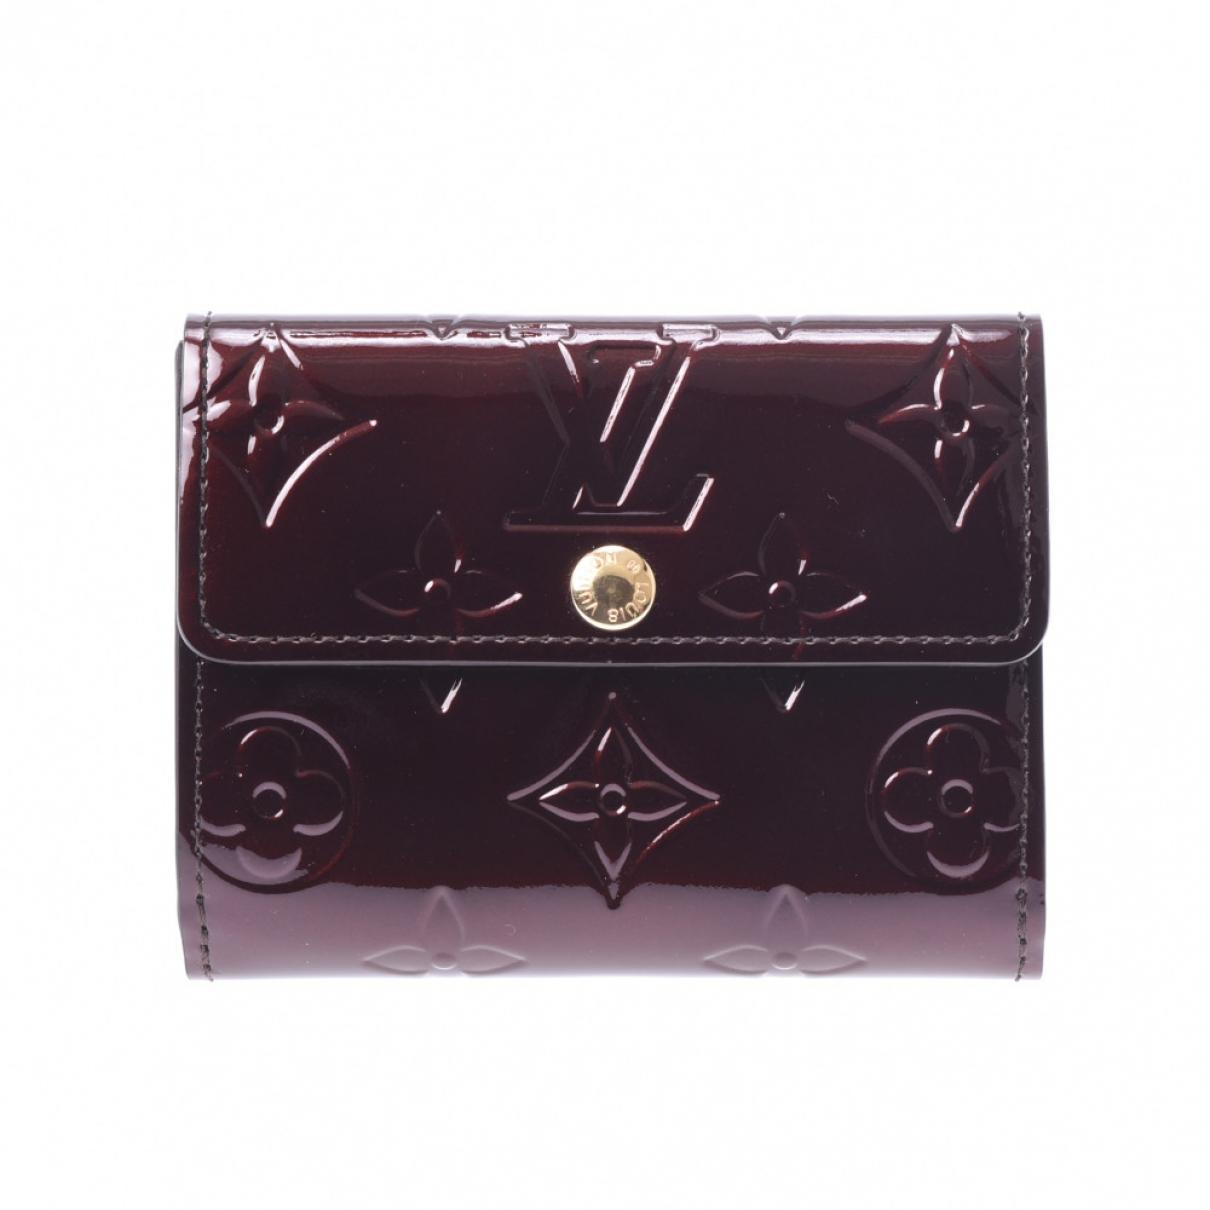 Louis Vuitton \N Kleinlederwaren in  Bordeauxrot Lackleder